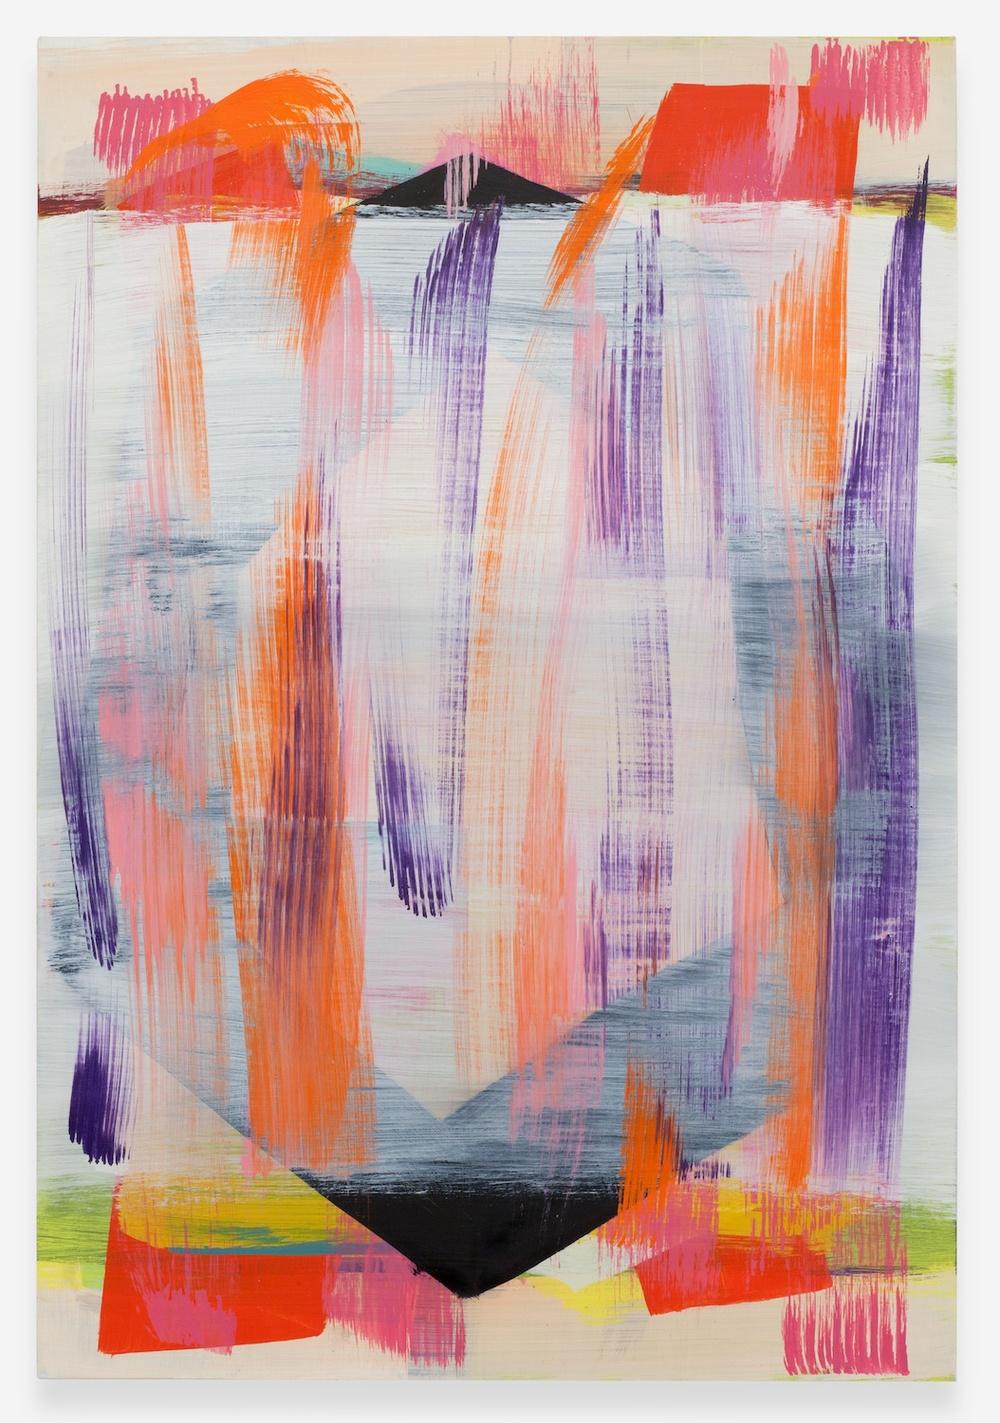 "Jon Pestoni Too Far Far 2013 Oil on canvas 45"" x 31"" JP134"